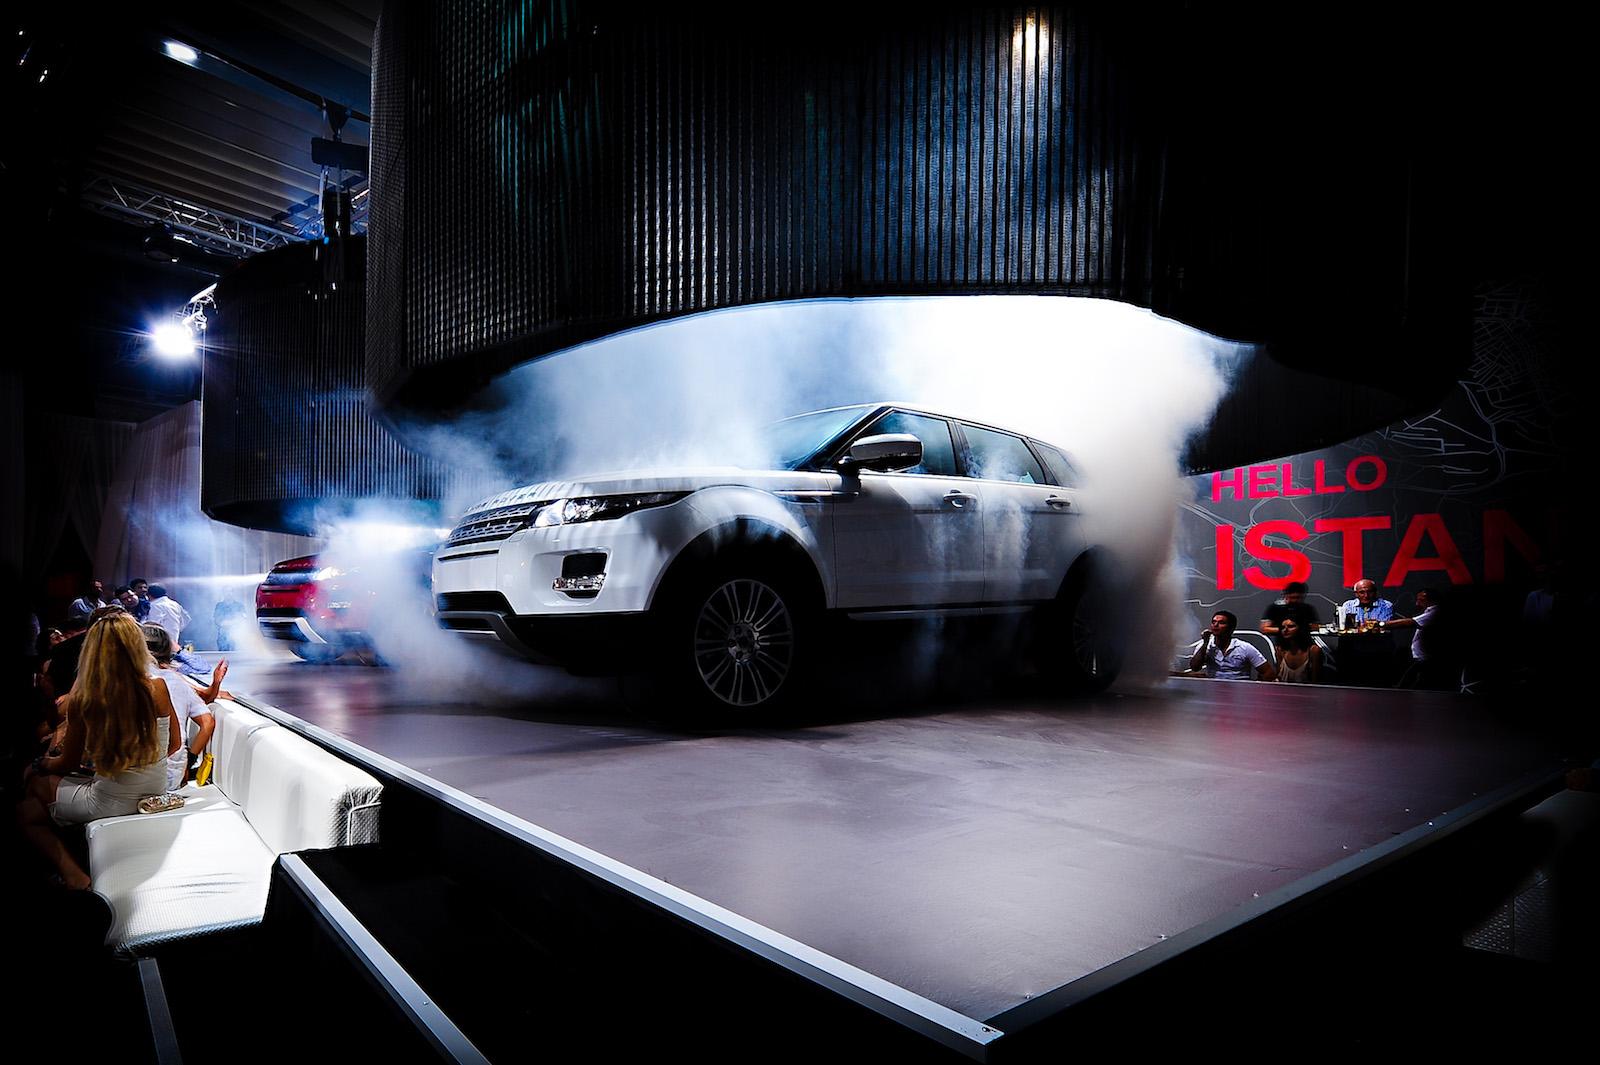 August,2011 Range Rover Evoque Summer Party, Galatasaray Island